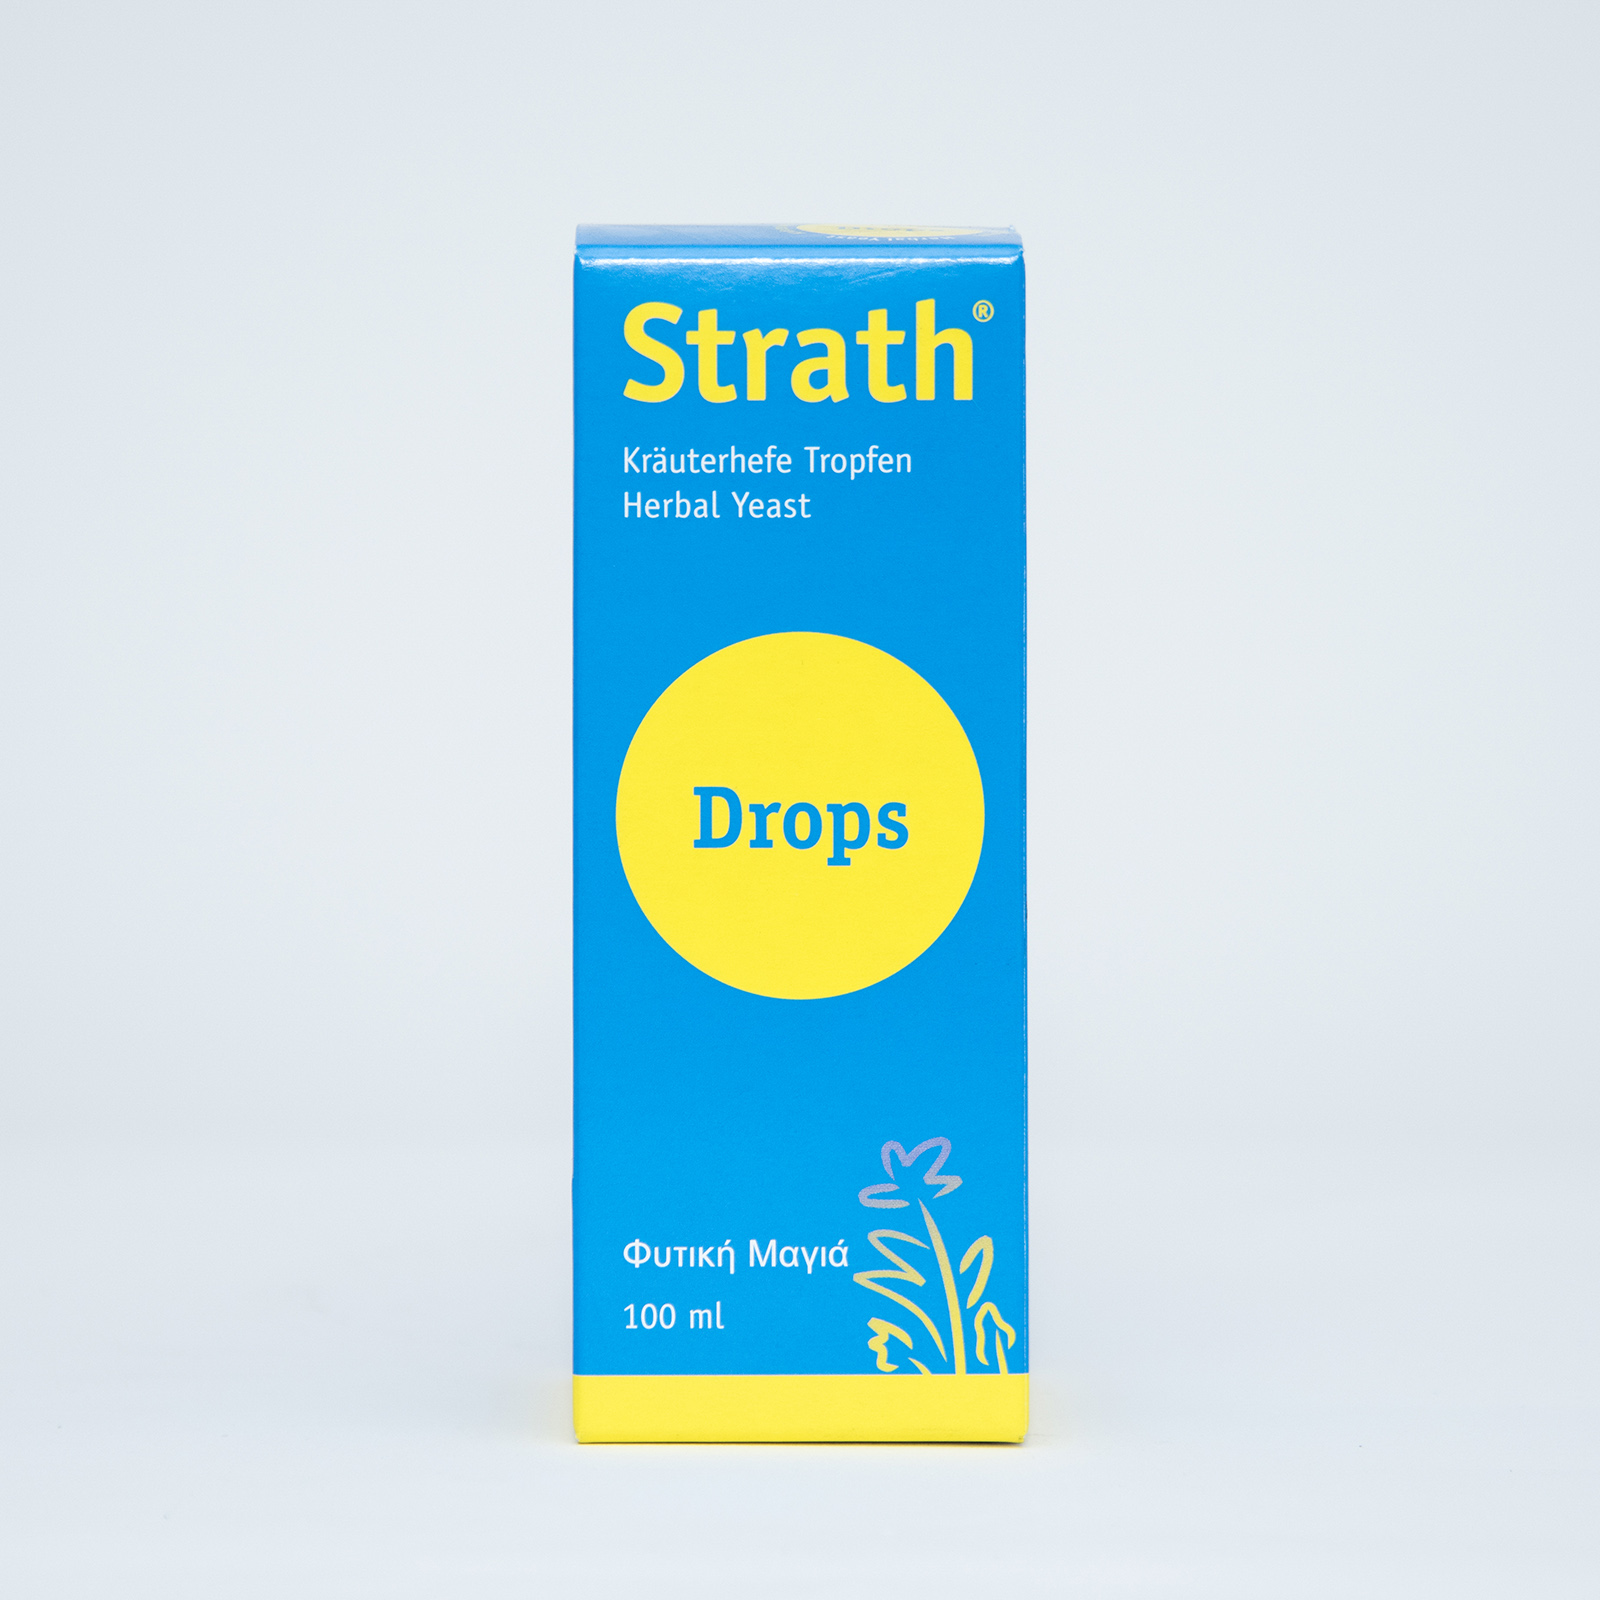 Strath Drops 100ml